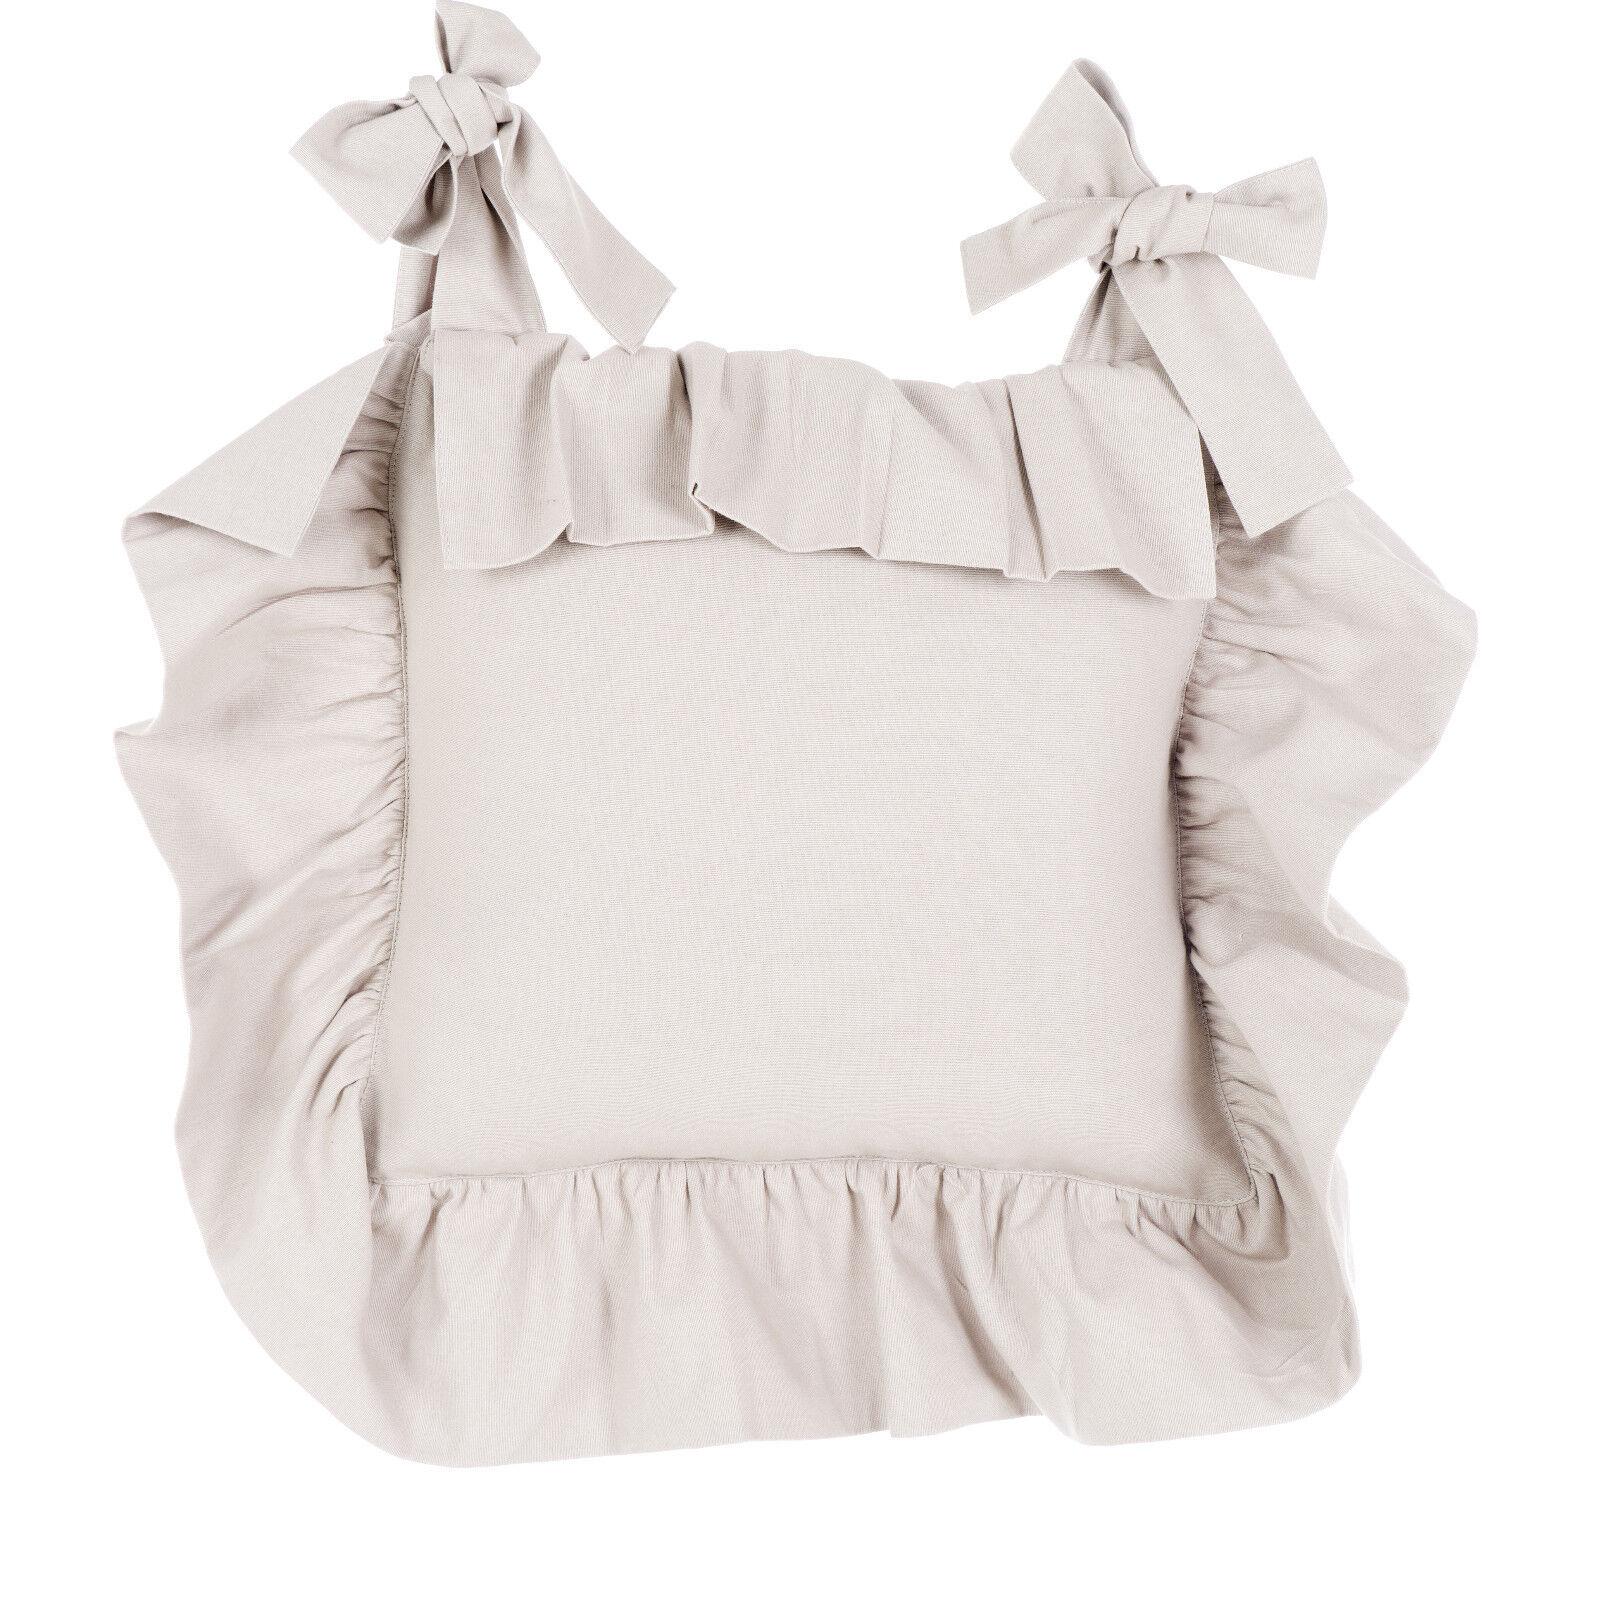 Details zu Blanc Mariclo Basic Sand Stuhlkissenbezug Shabby chic Landhaus  Vintage Volant